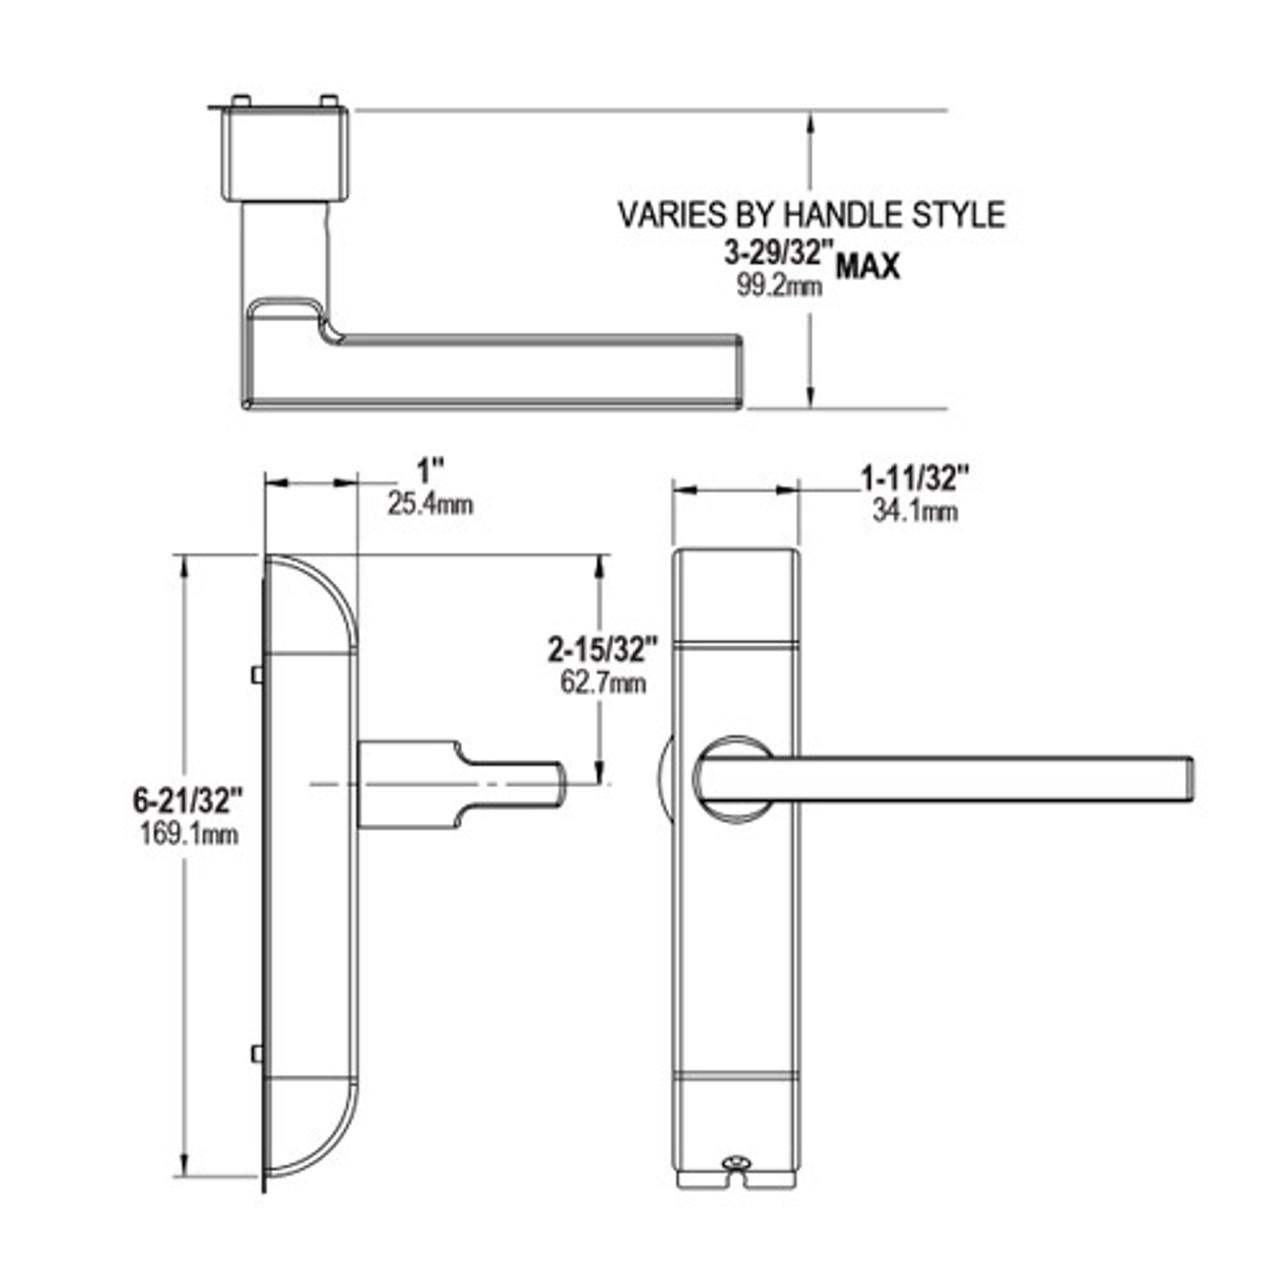 4600M-MI-621-US3 Adams Rite MI Designer handle Dimensional View